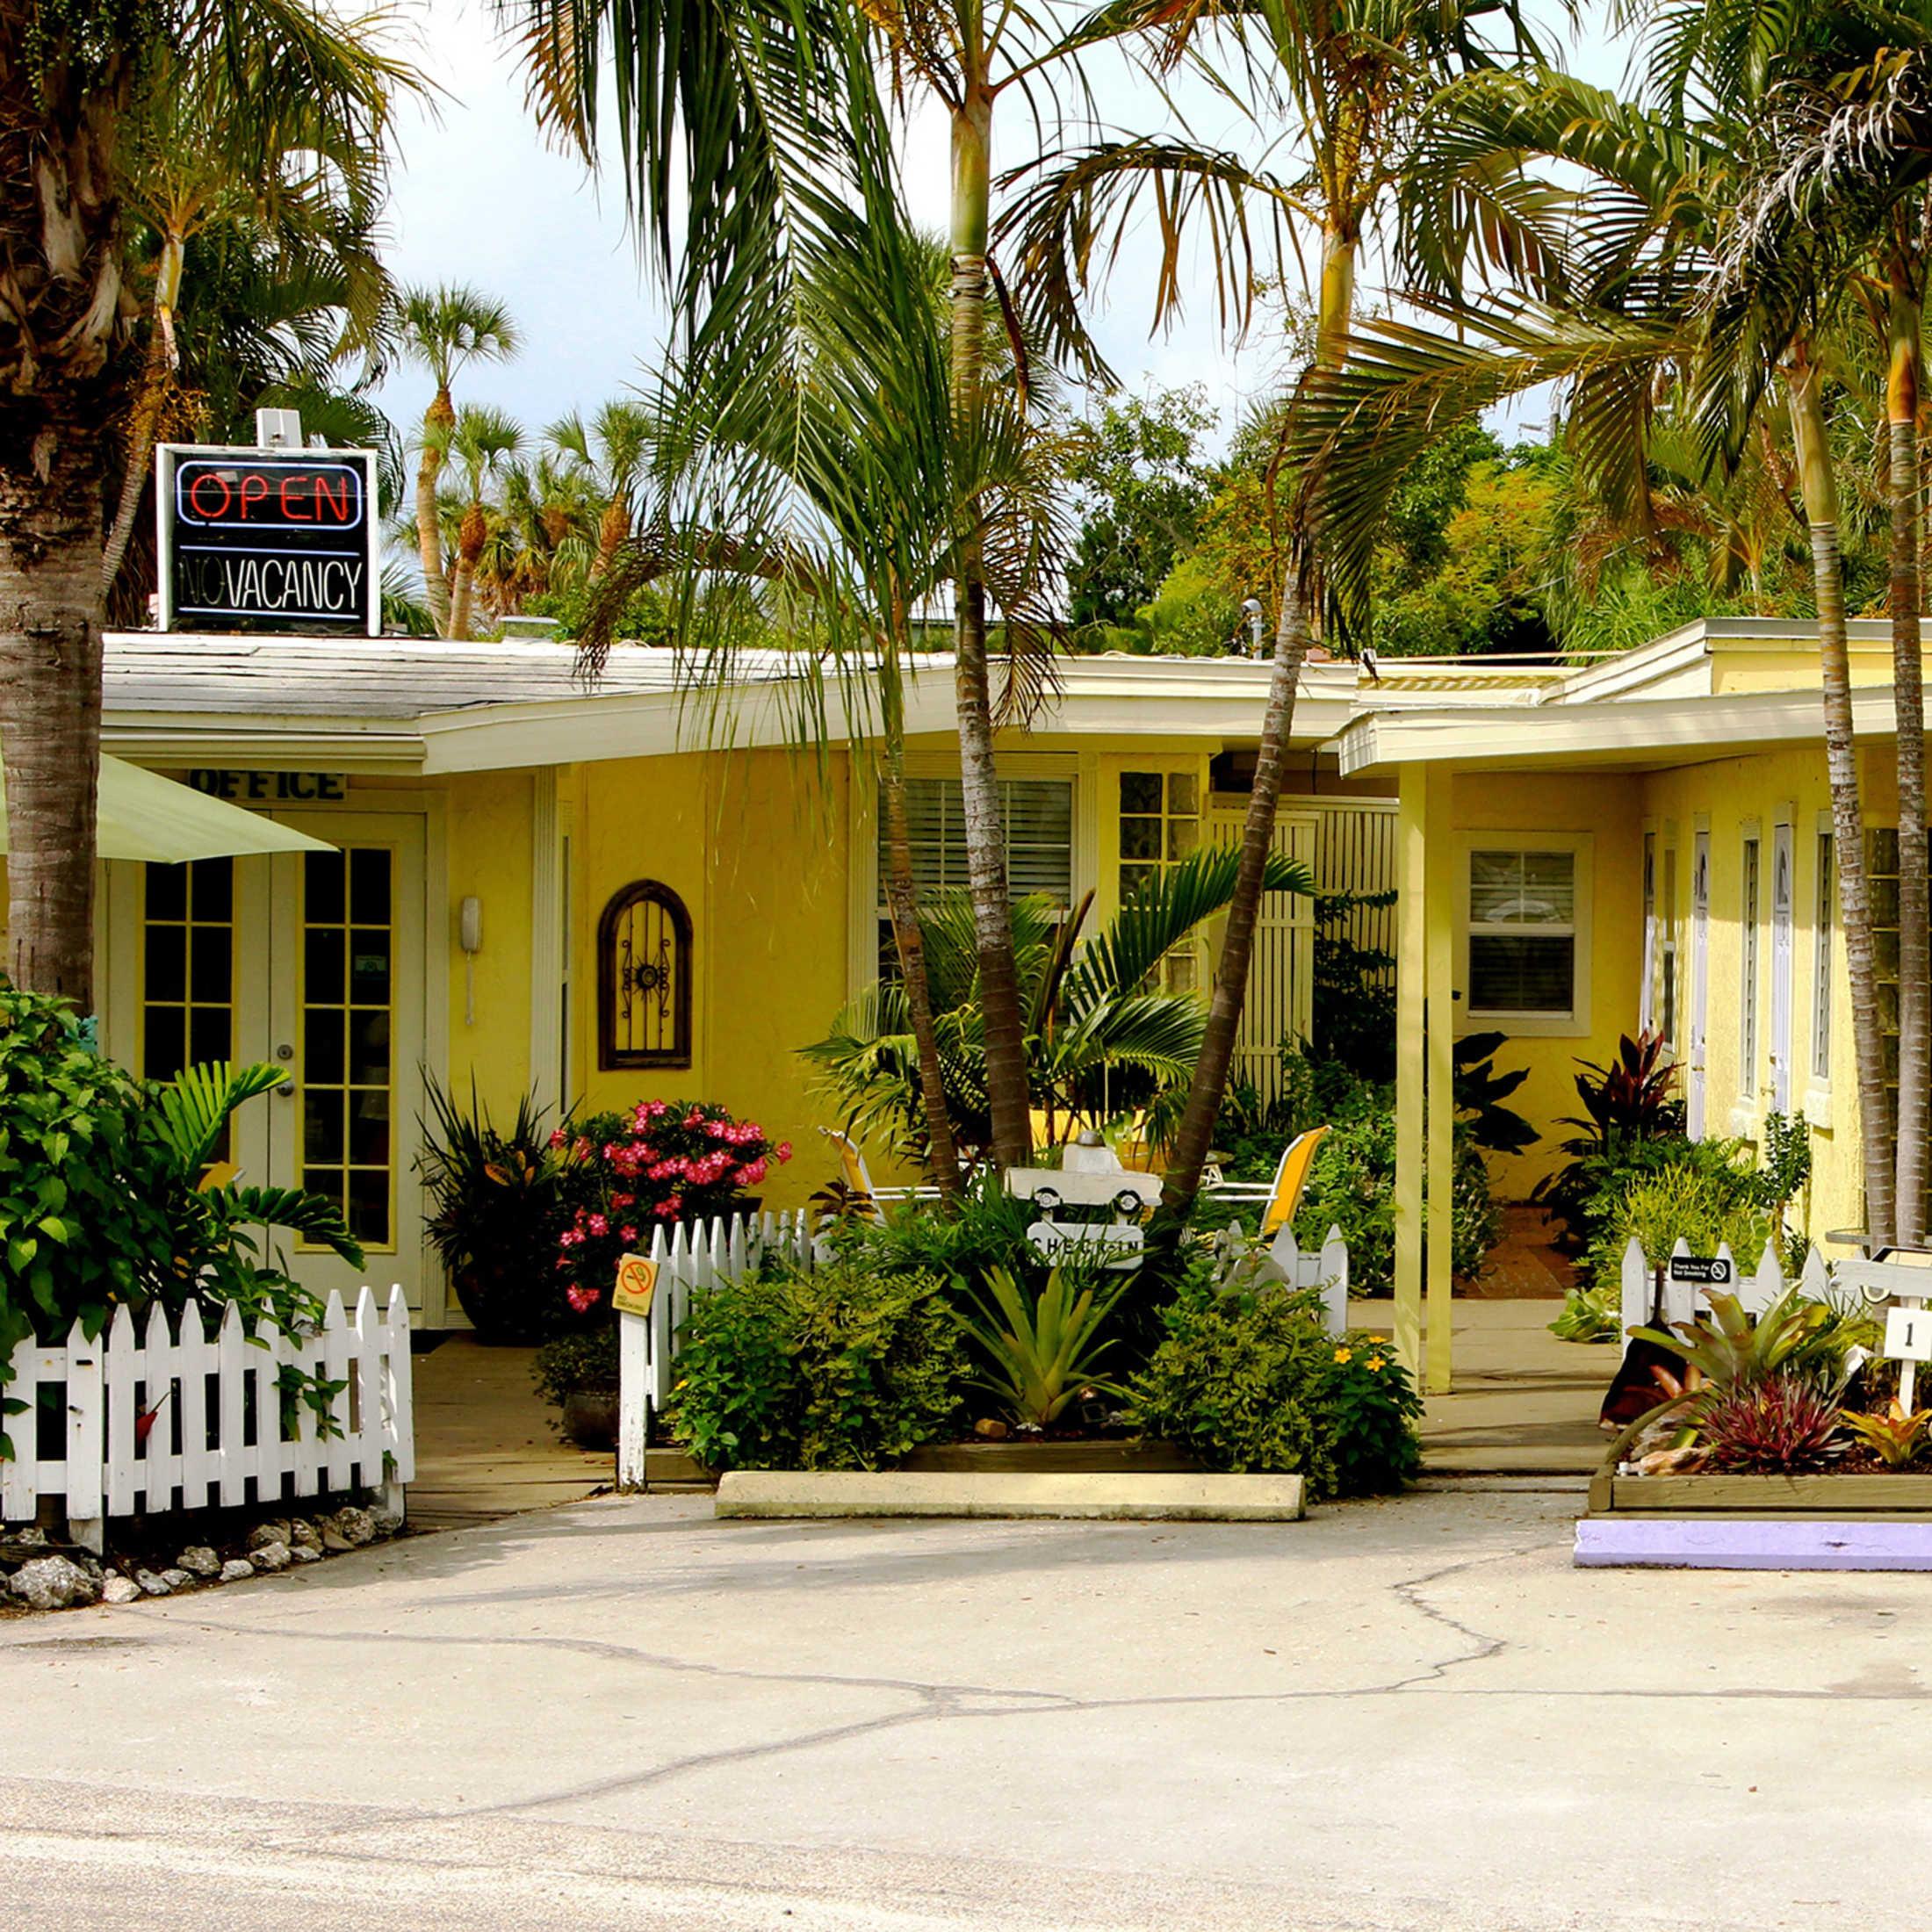 Beach House Anna Maria Island: Haley's Motel And Resort